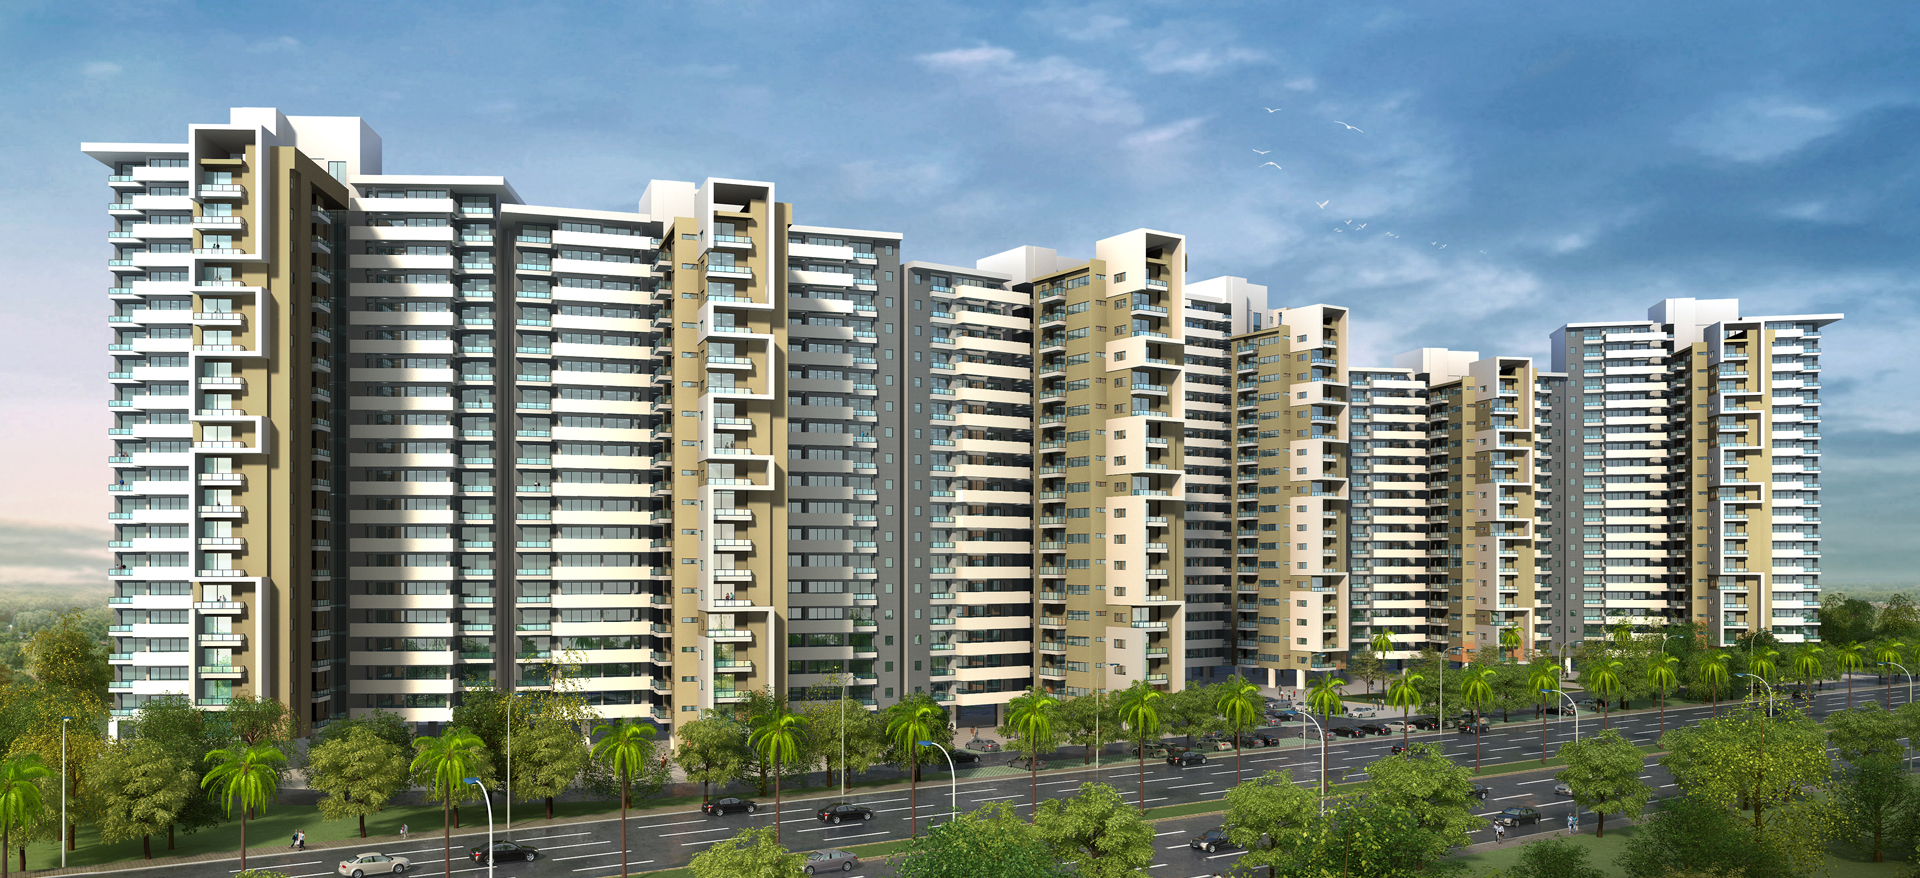 Pocket D Group Housing, Uttar Pradesh, India